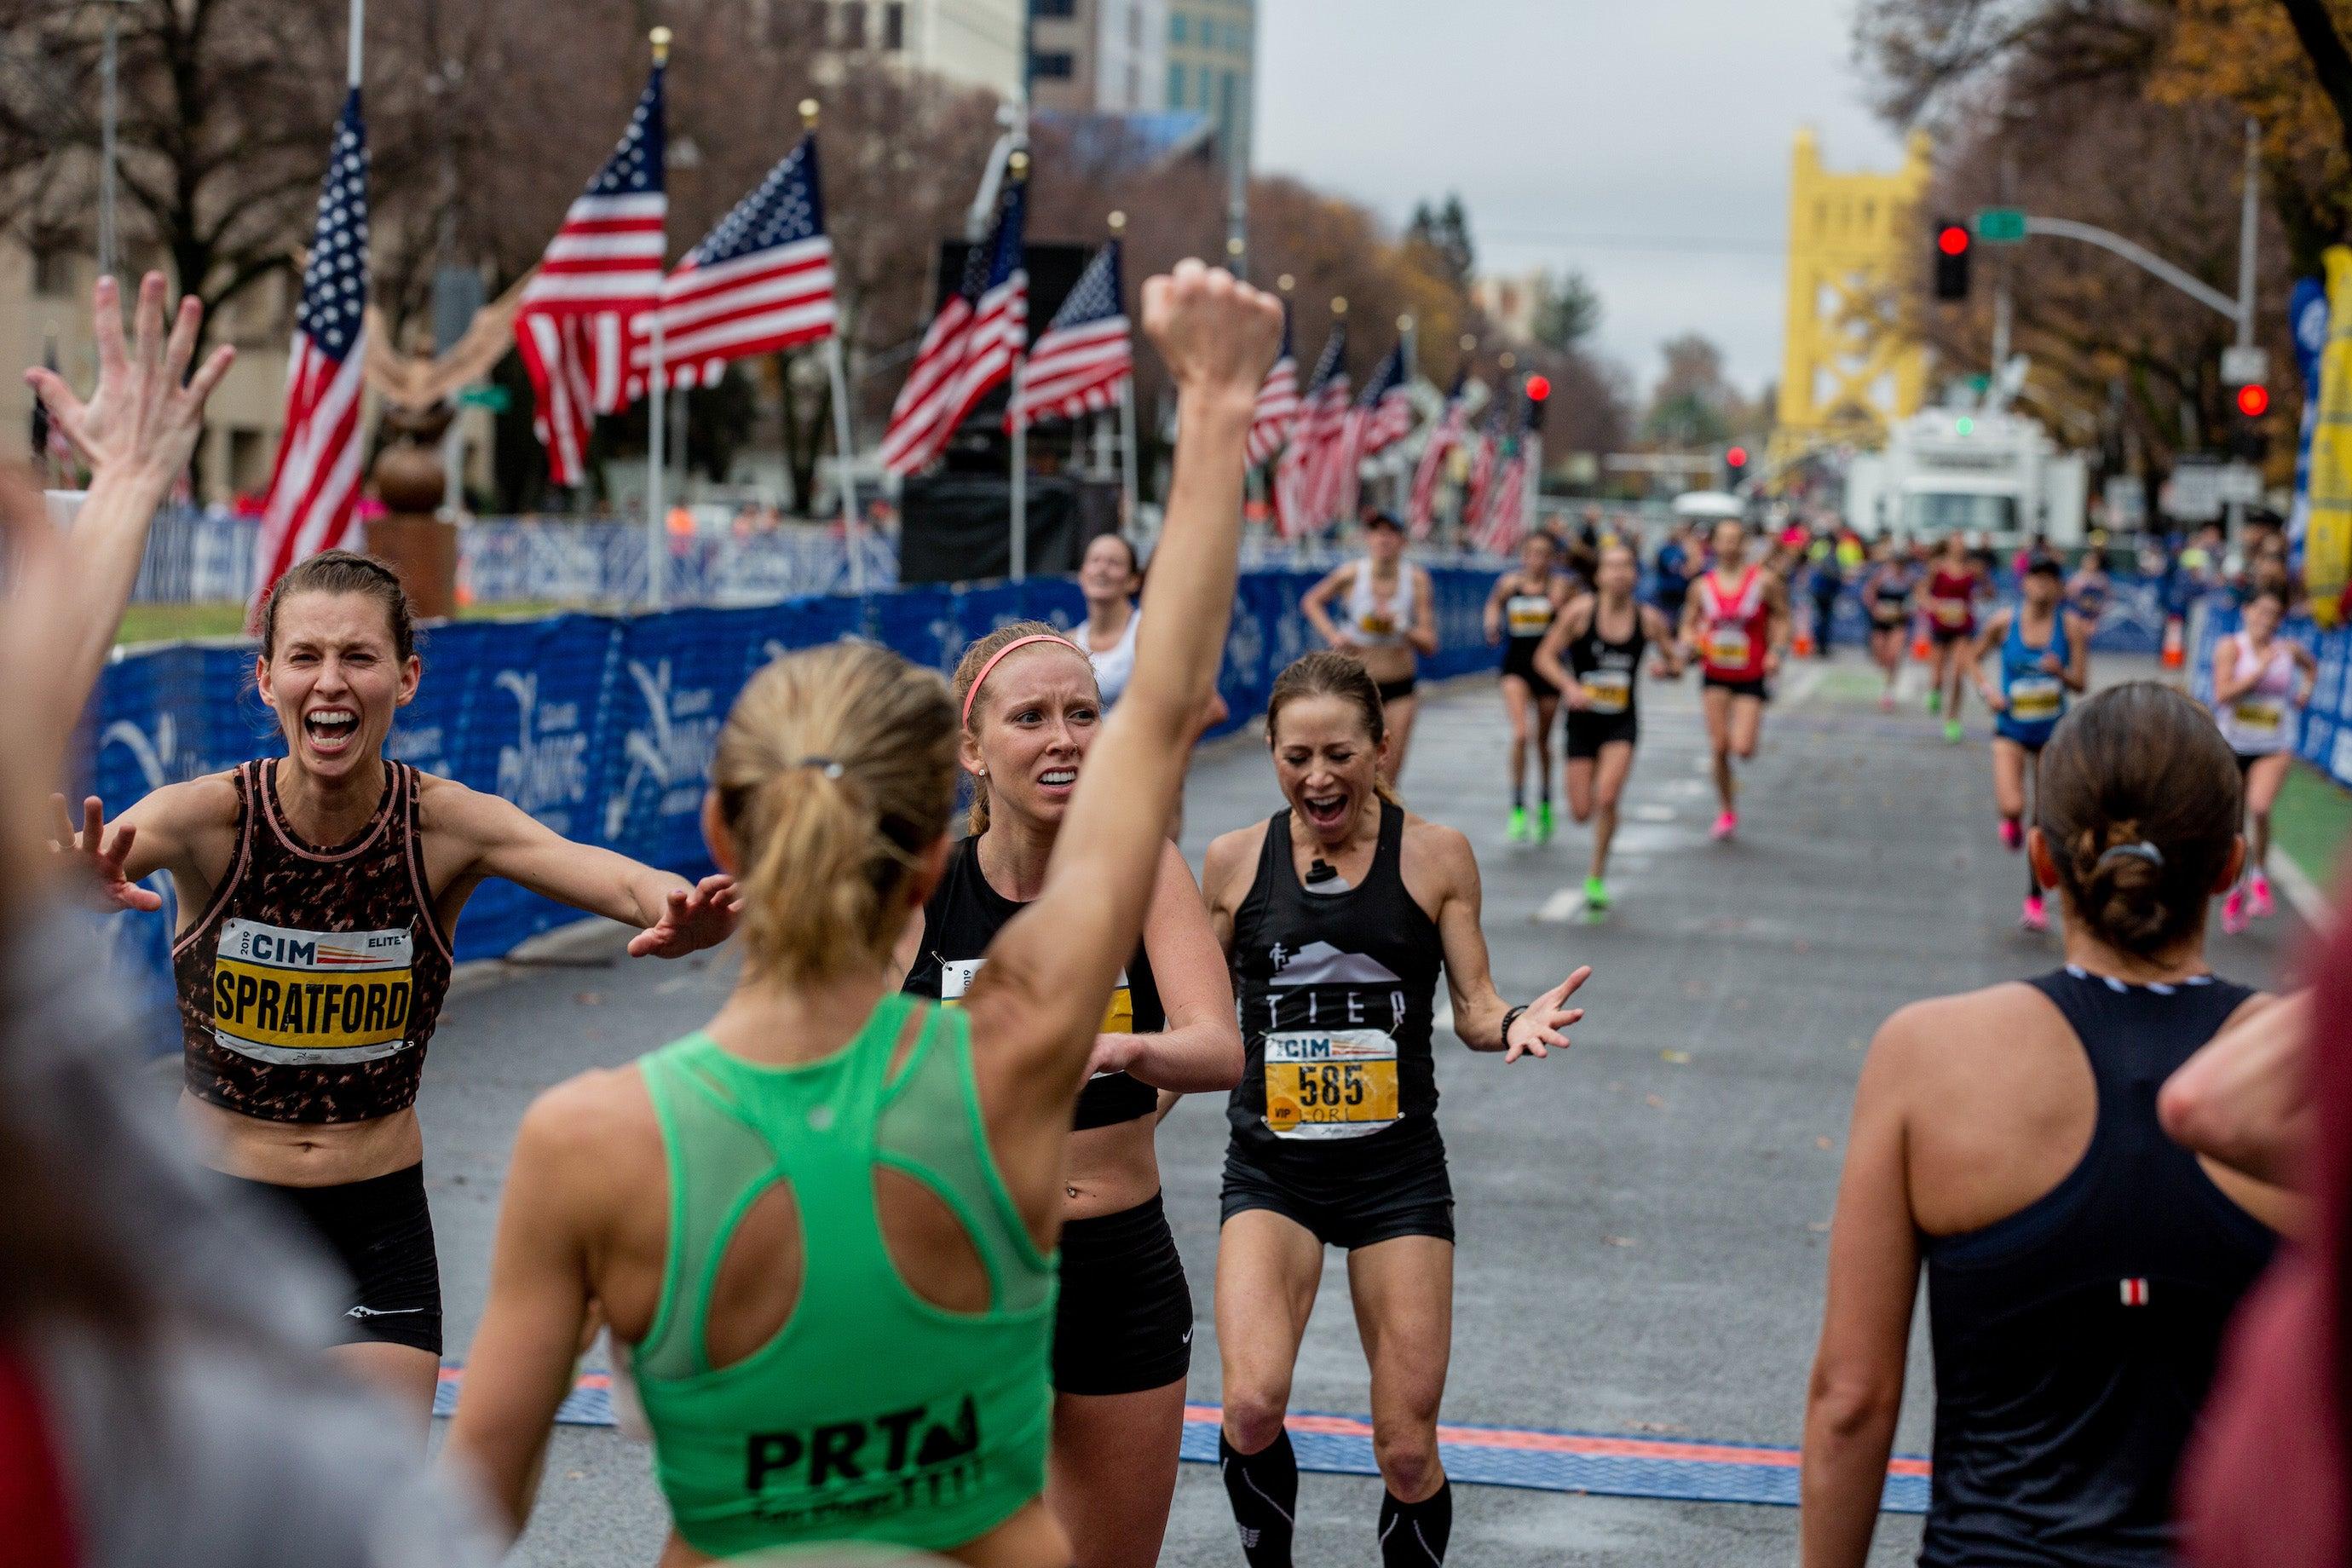 Runners qualify for the 2020 Olympic Marathon Trials at the 2019 California International Marathon.